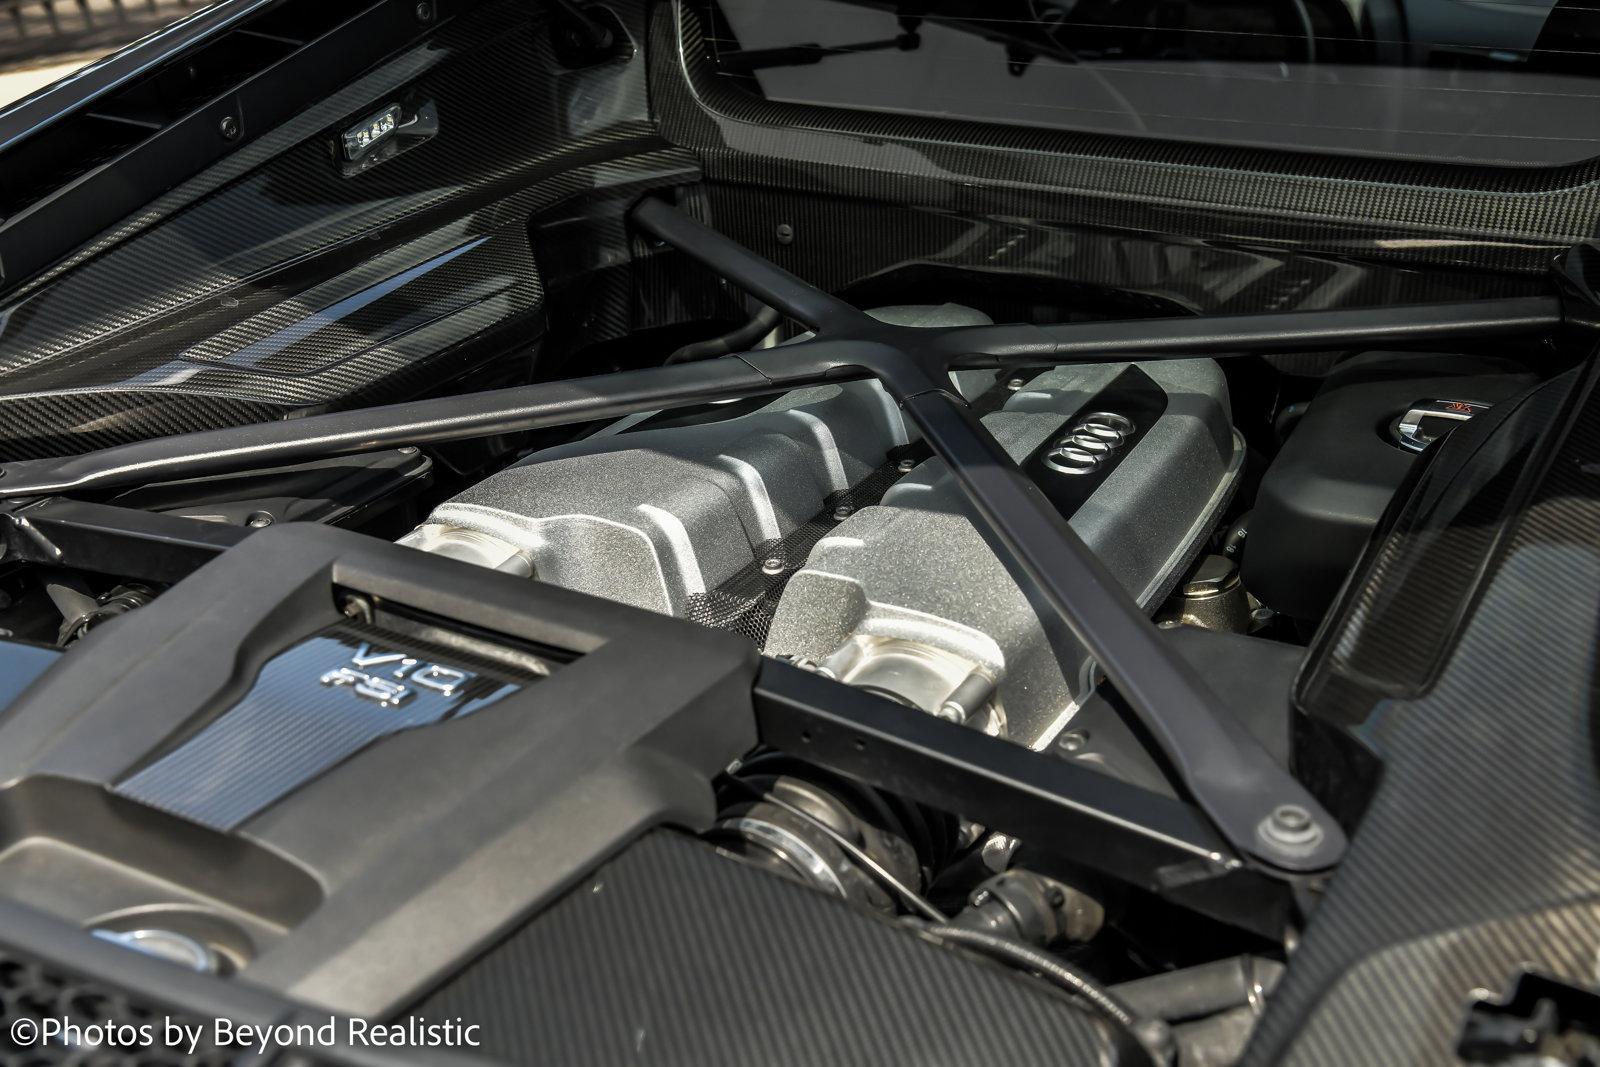 Used 2018 Audi R8 Coupe V10 Plus, Black Optic Pkg, | Downers Grove, IL